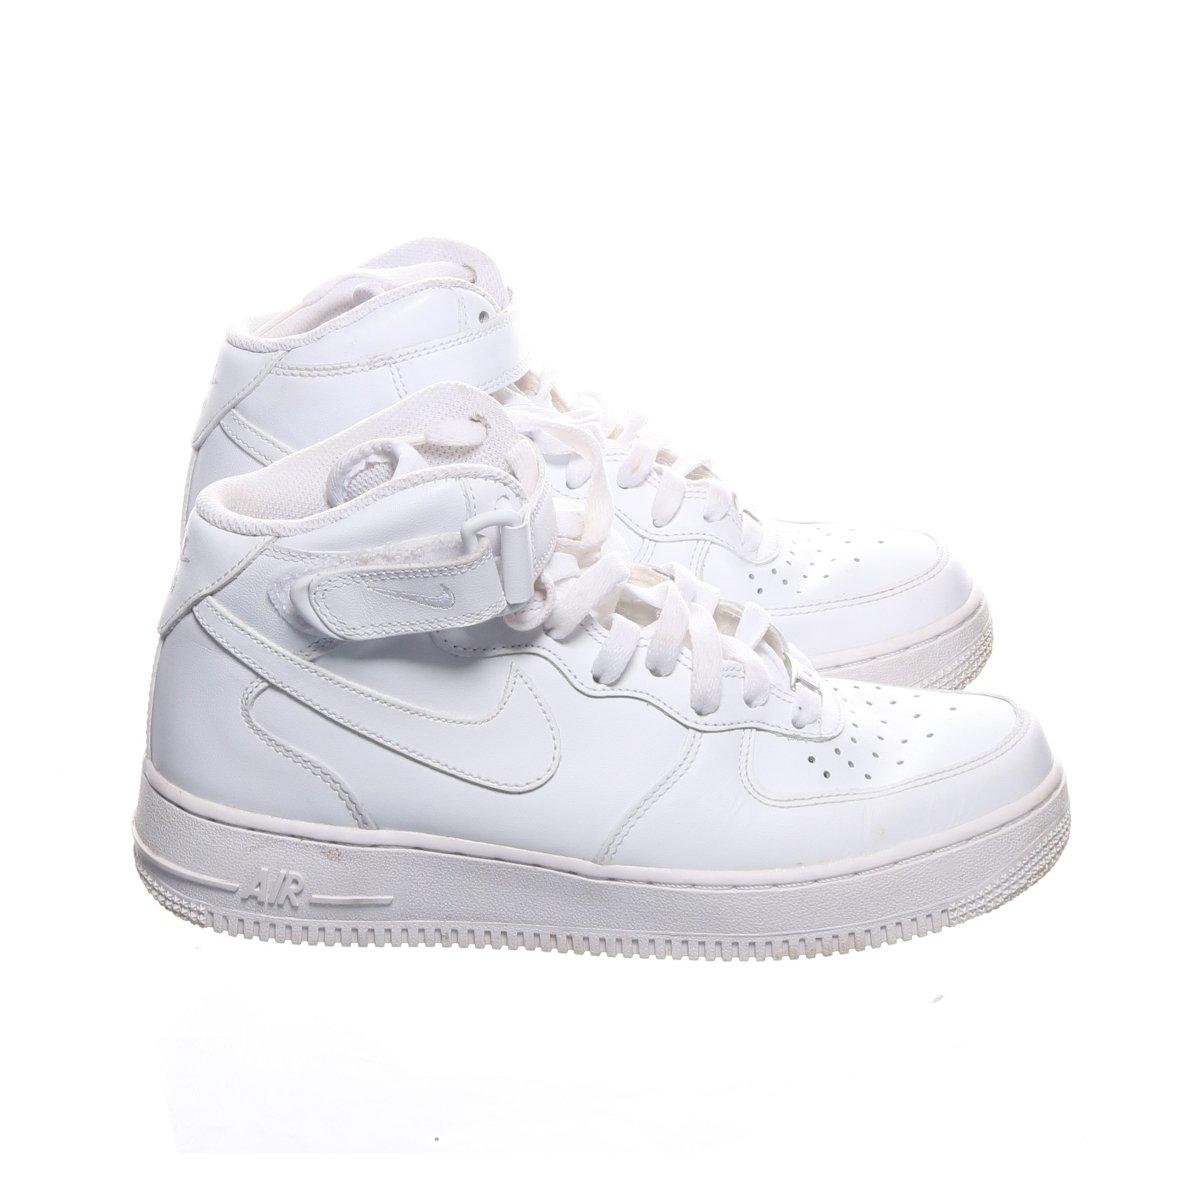 Nike, Sneakers, Strl: 39, air force 1, Vit